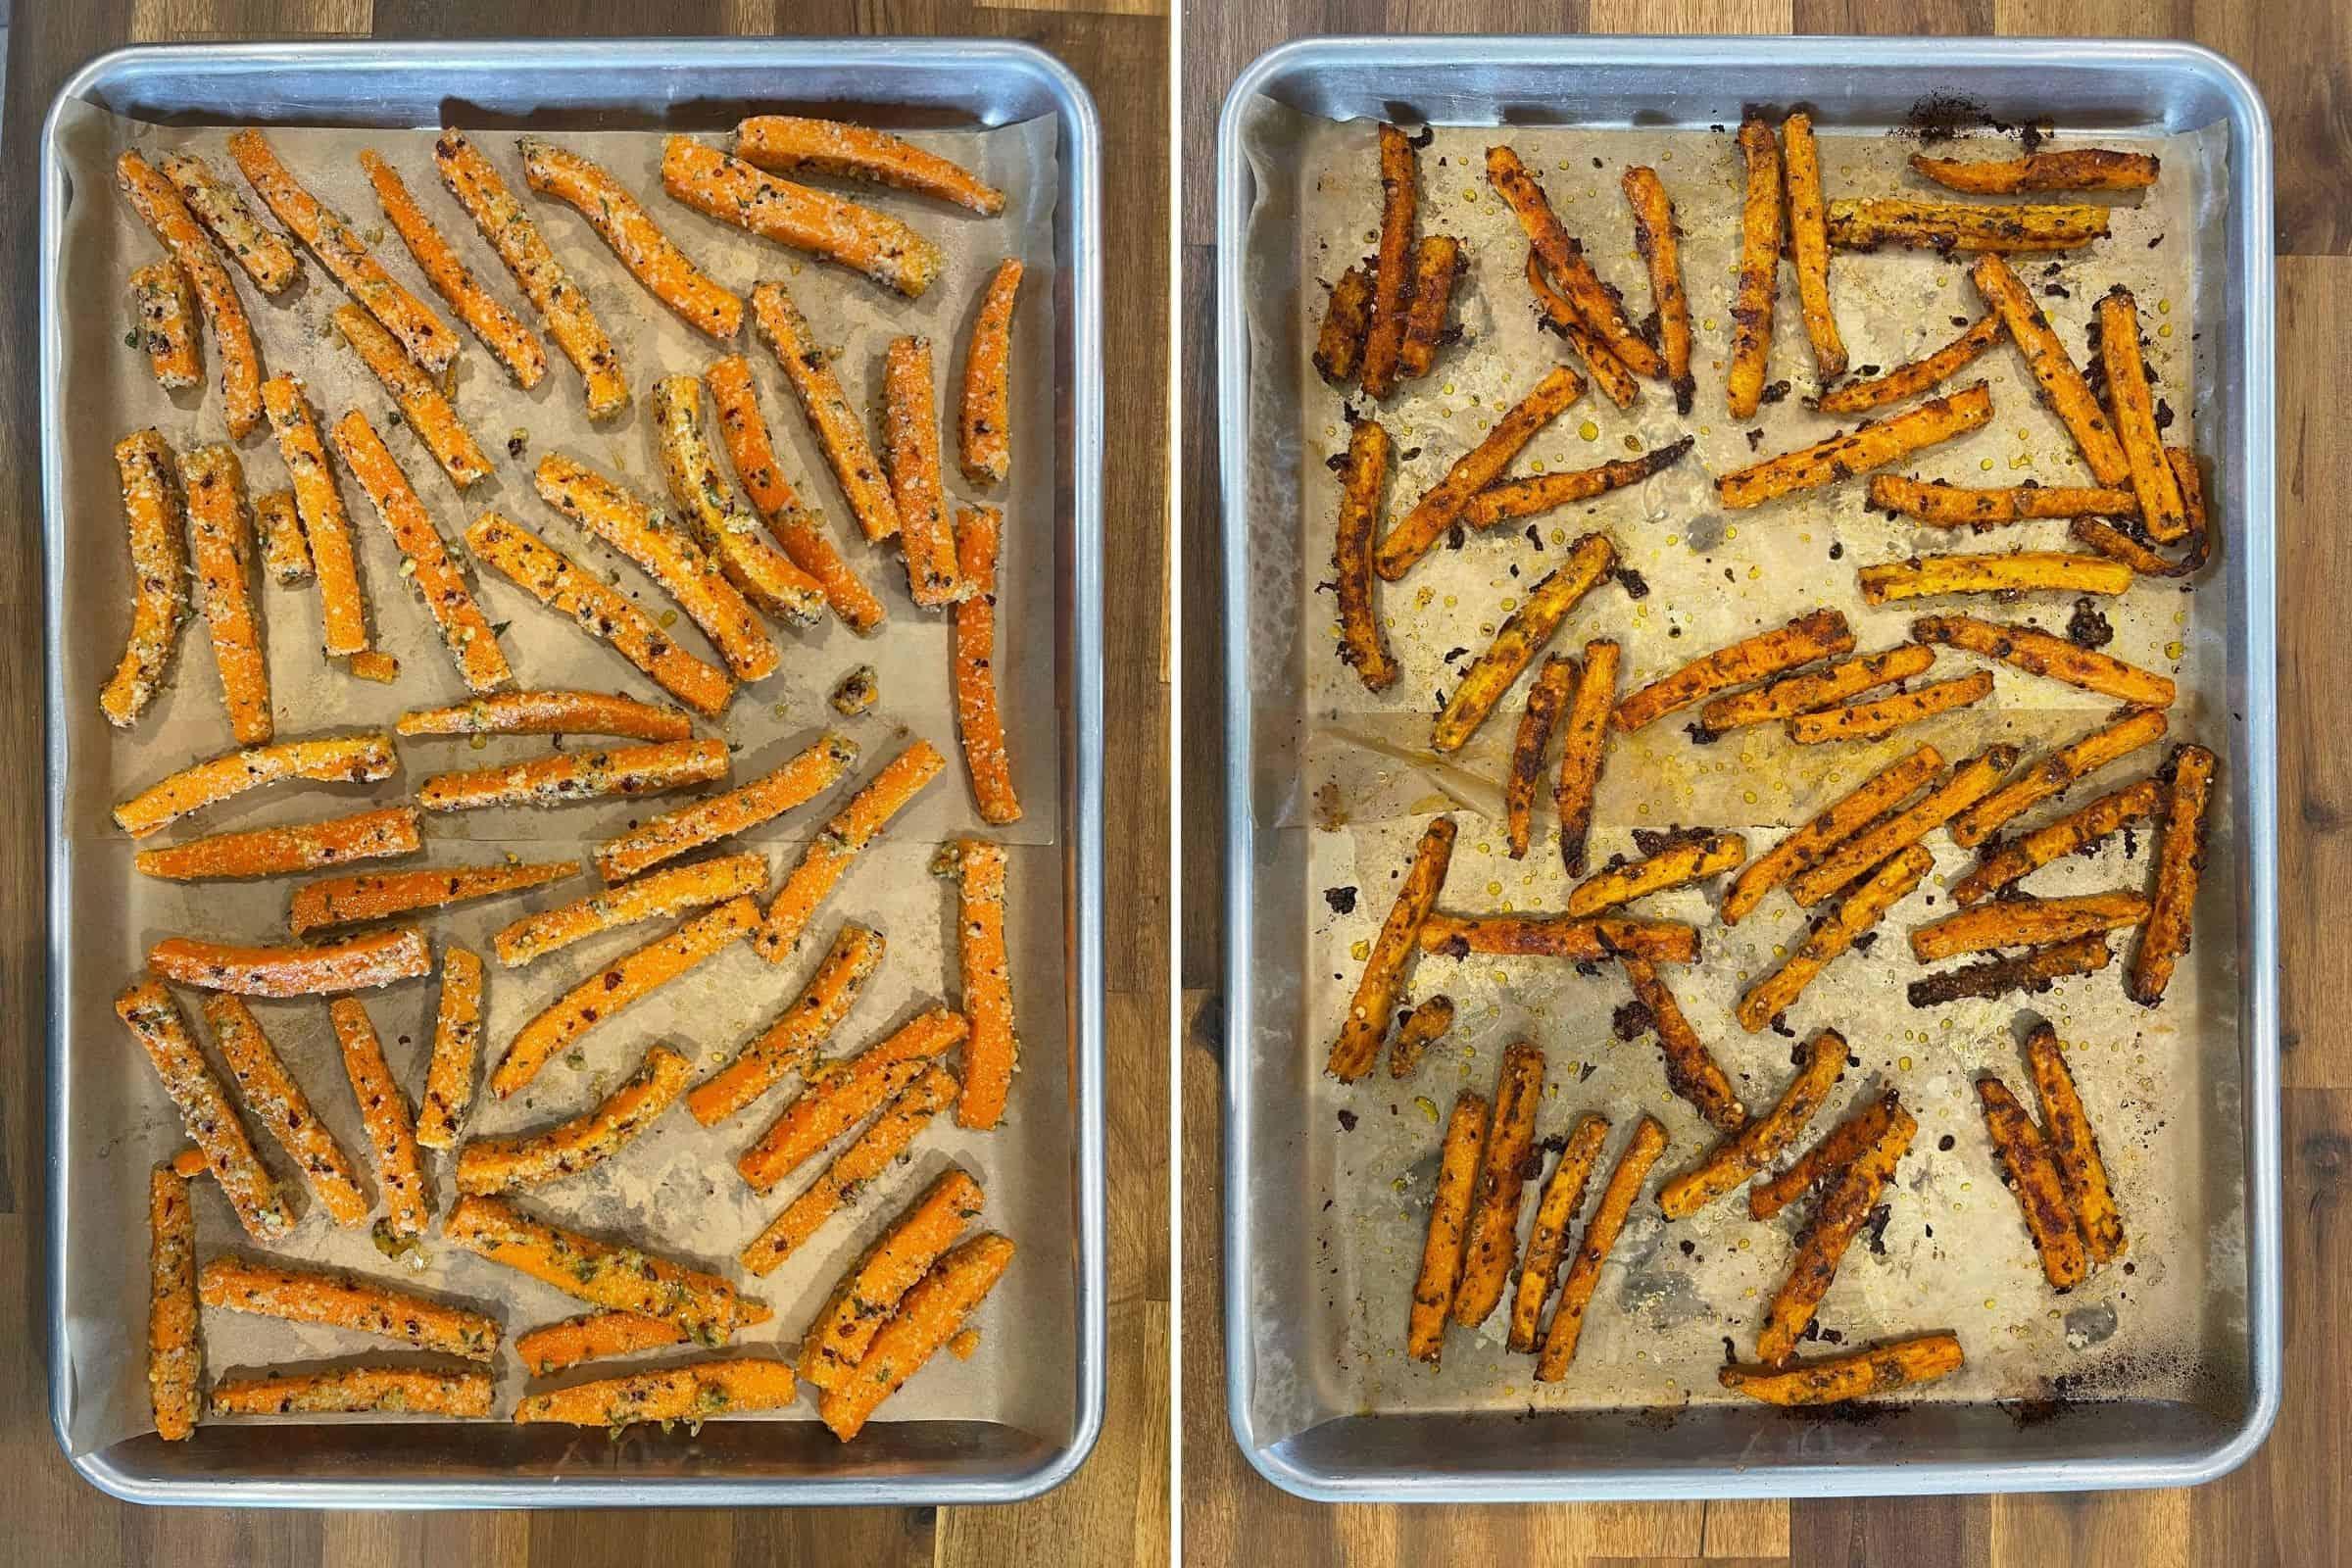 garlic parmesan carrot sticks before and after baking on a half sheet pan